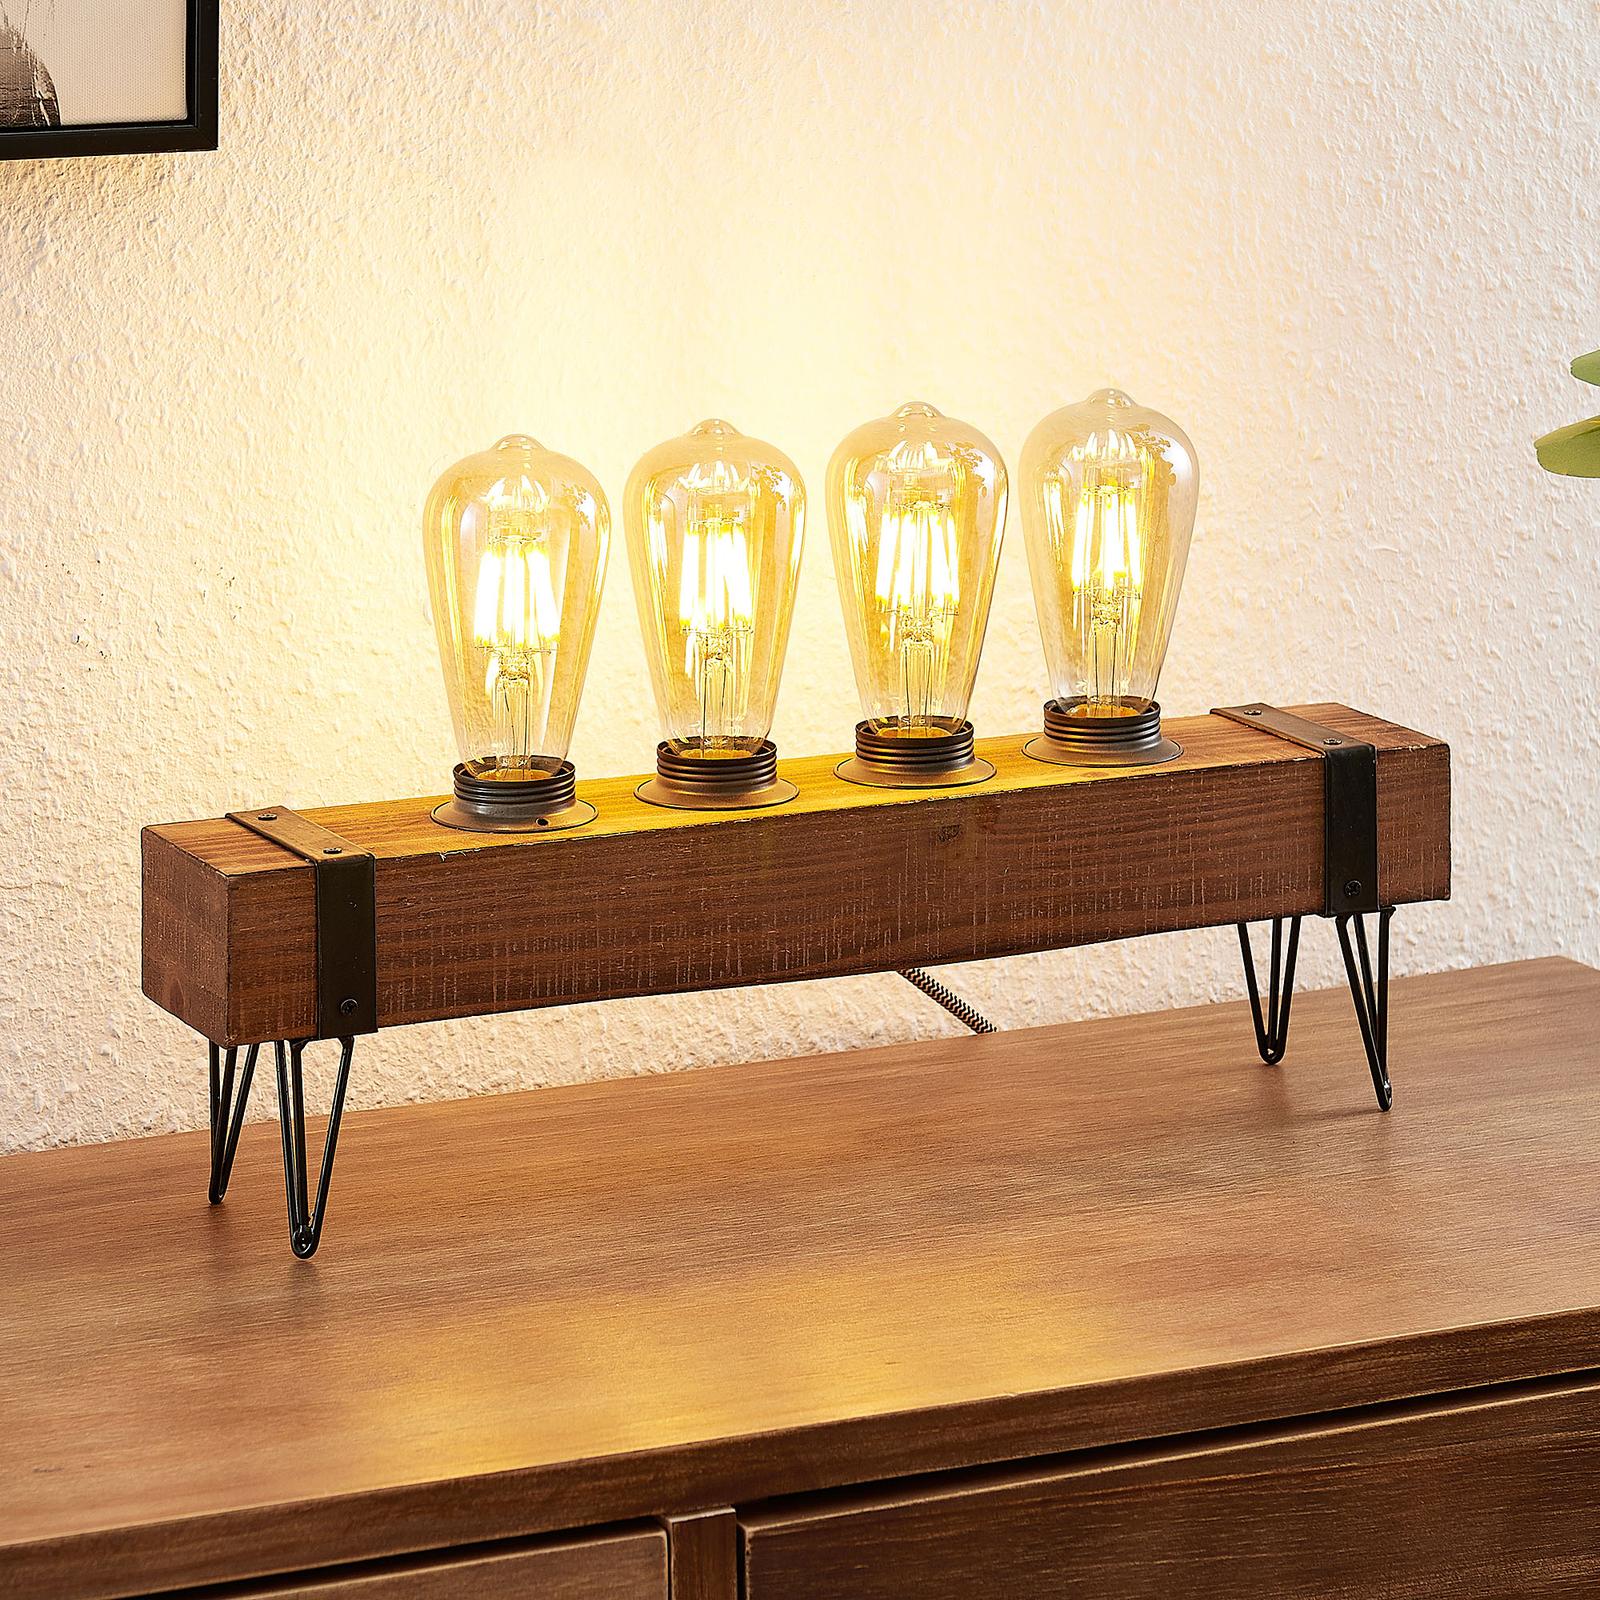 Lindby Sverina lampe à poser en bois, à 4 lampes